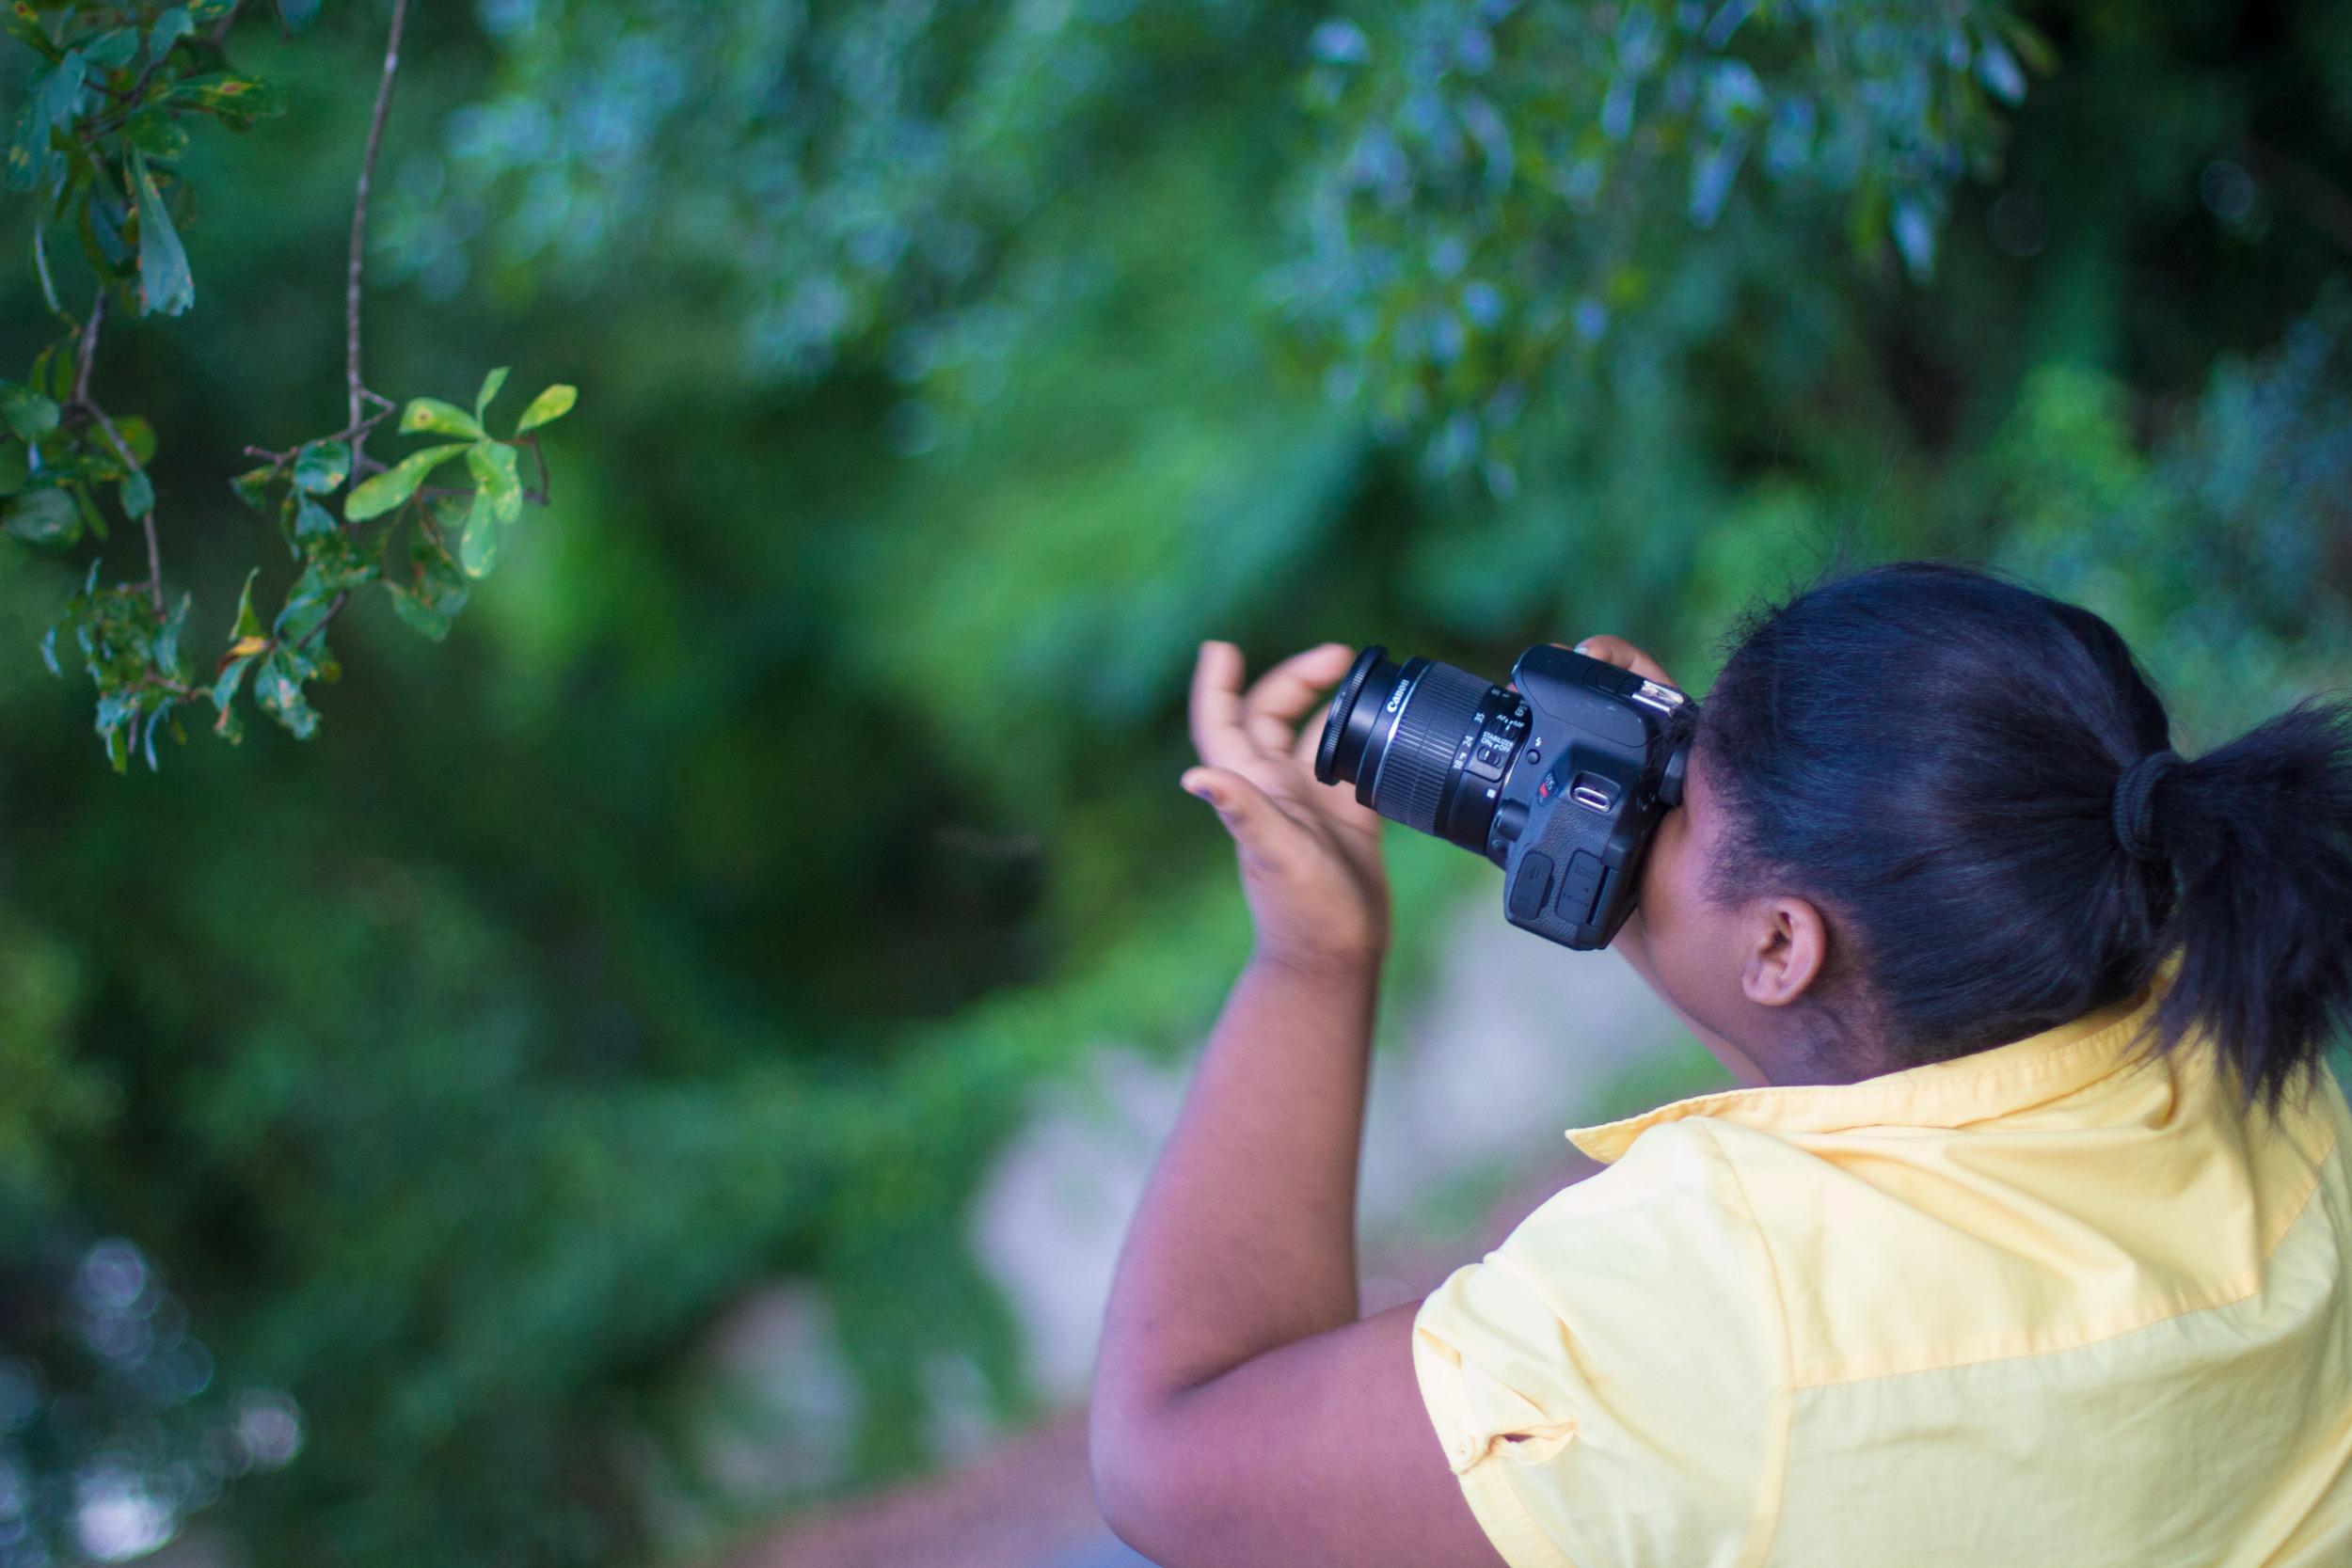 Kimora learning the art of photography